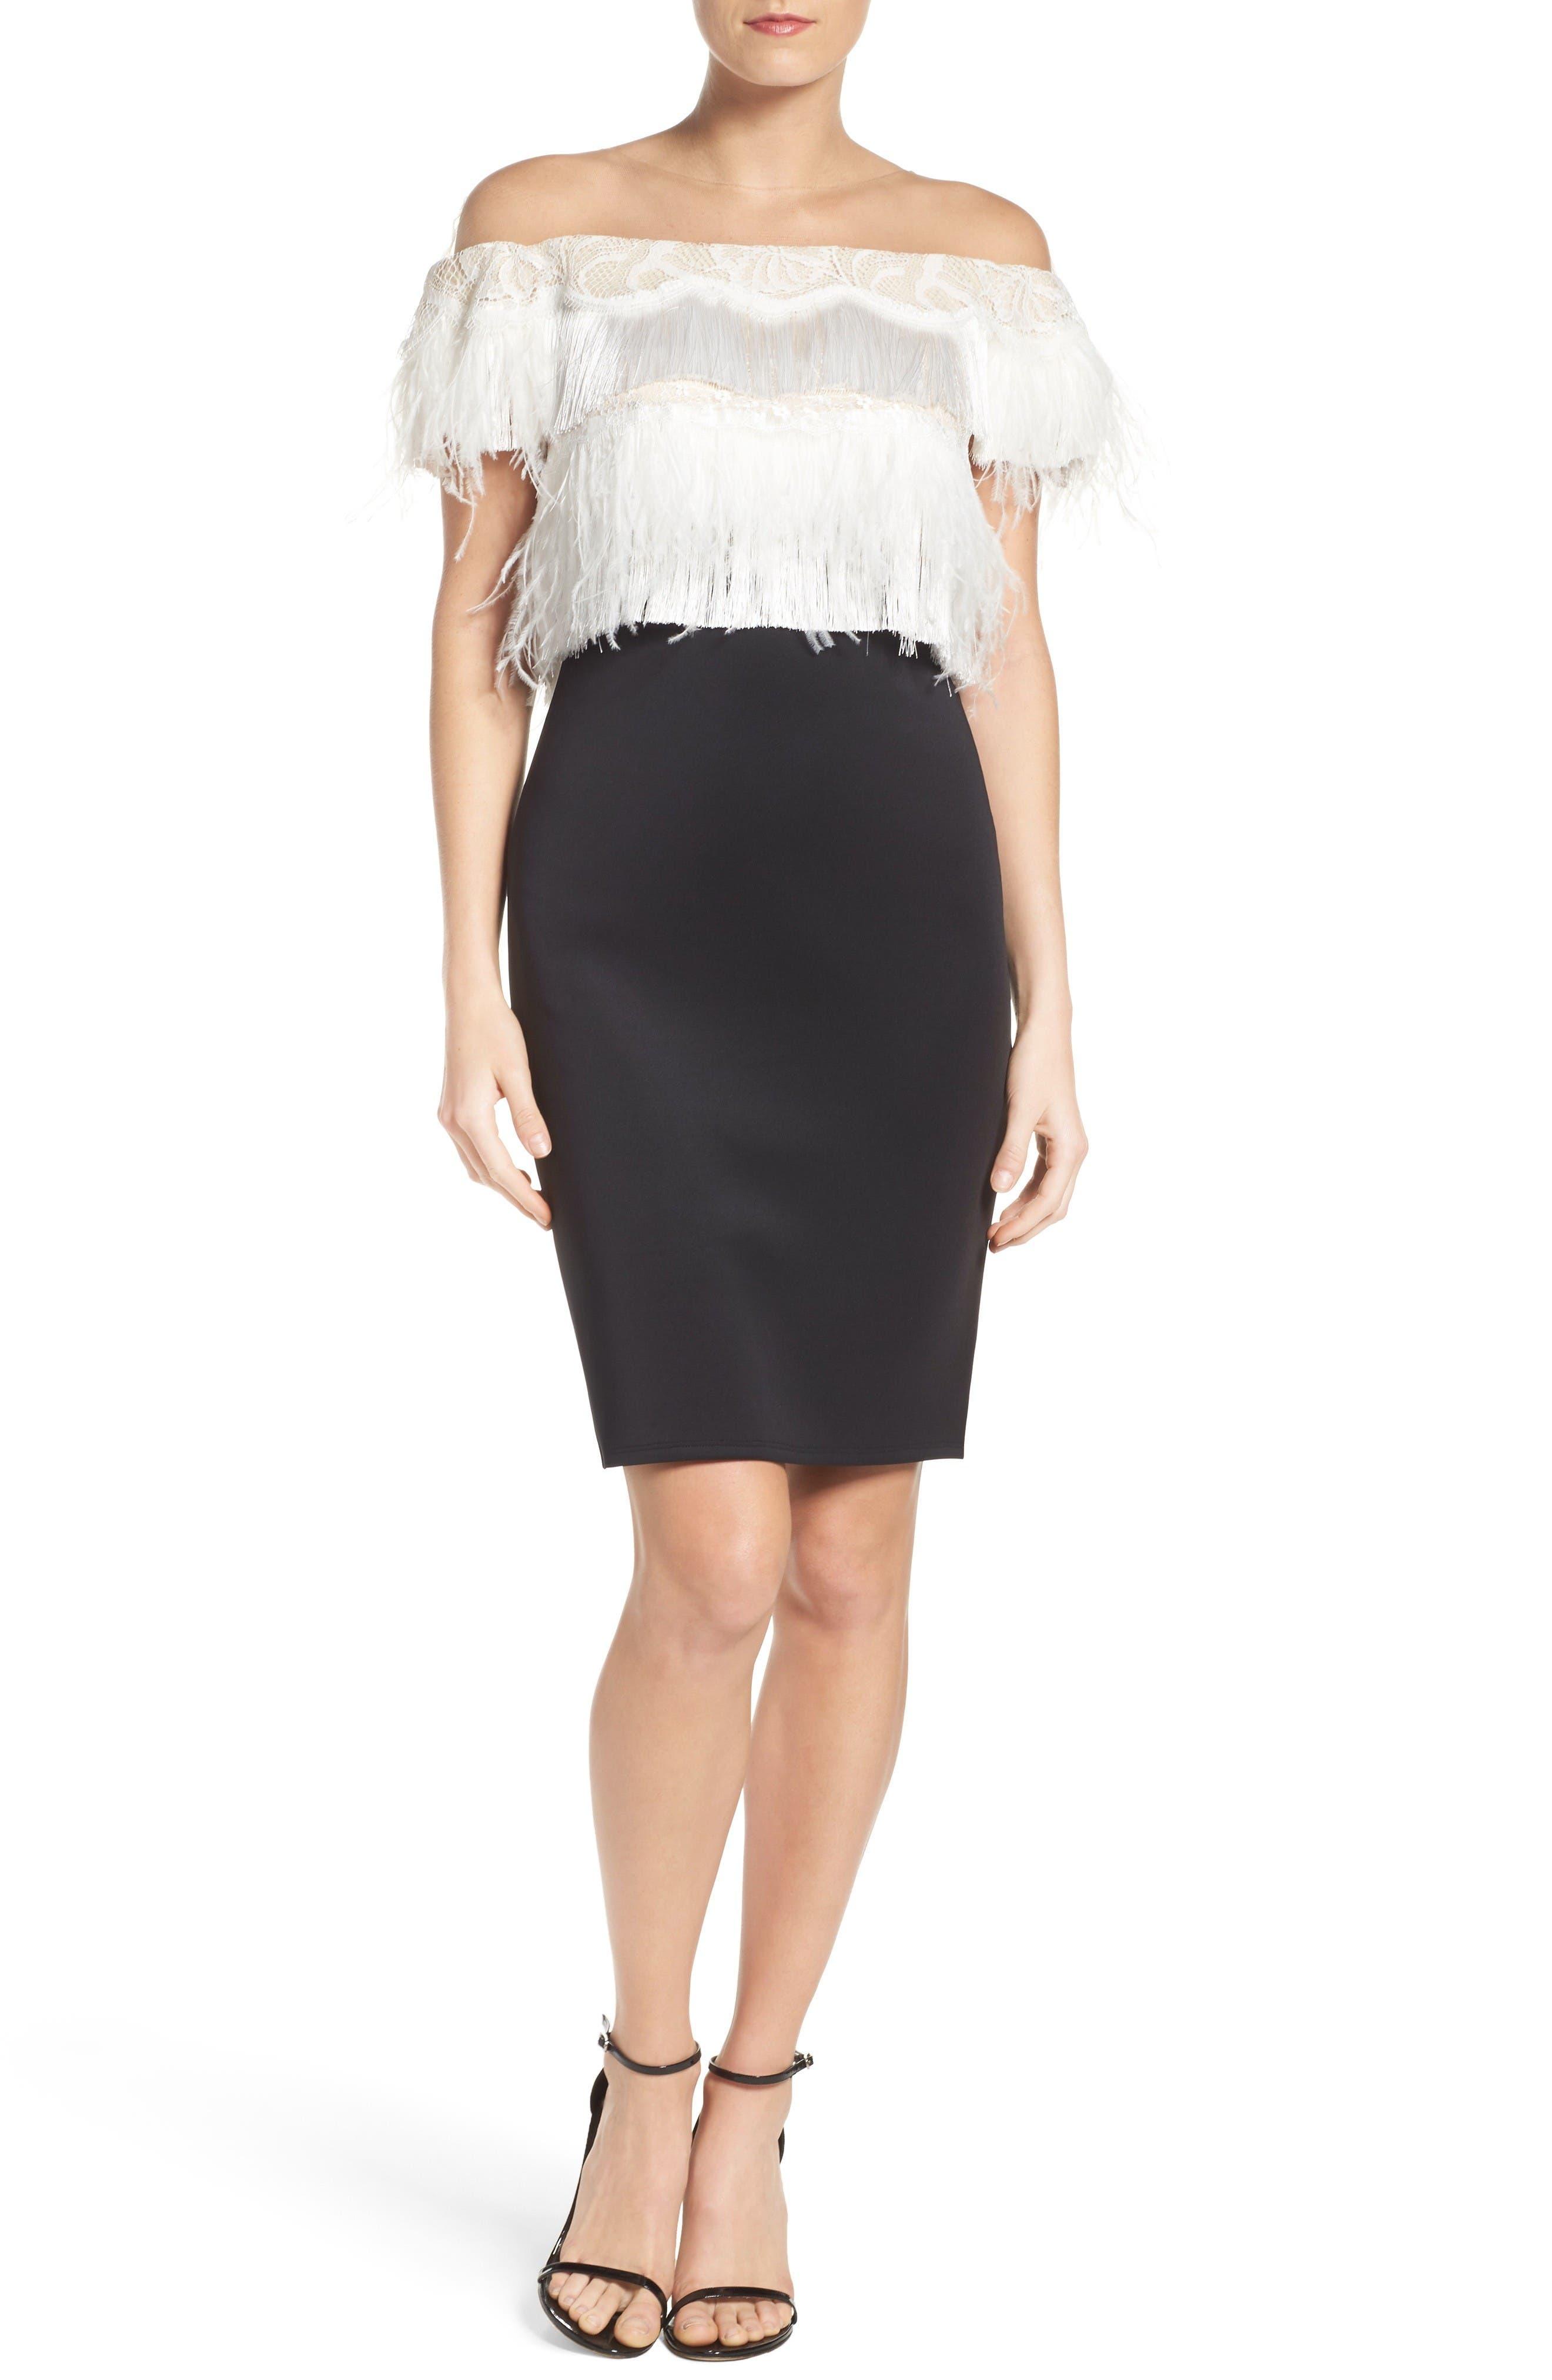 Off the Shoulder Sheath Dress,                             Alternate thumbnail 4, color,                             Black/ Ivory